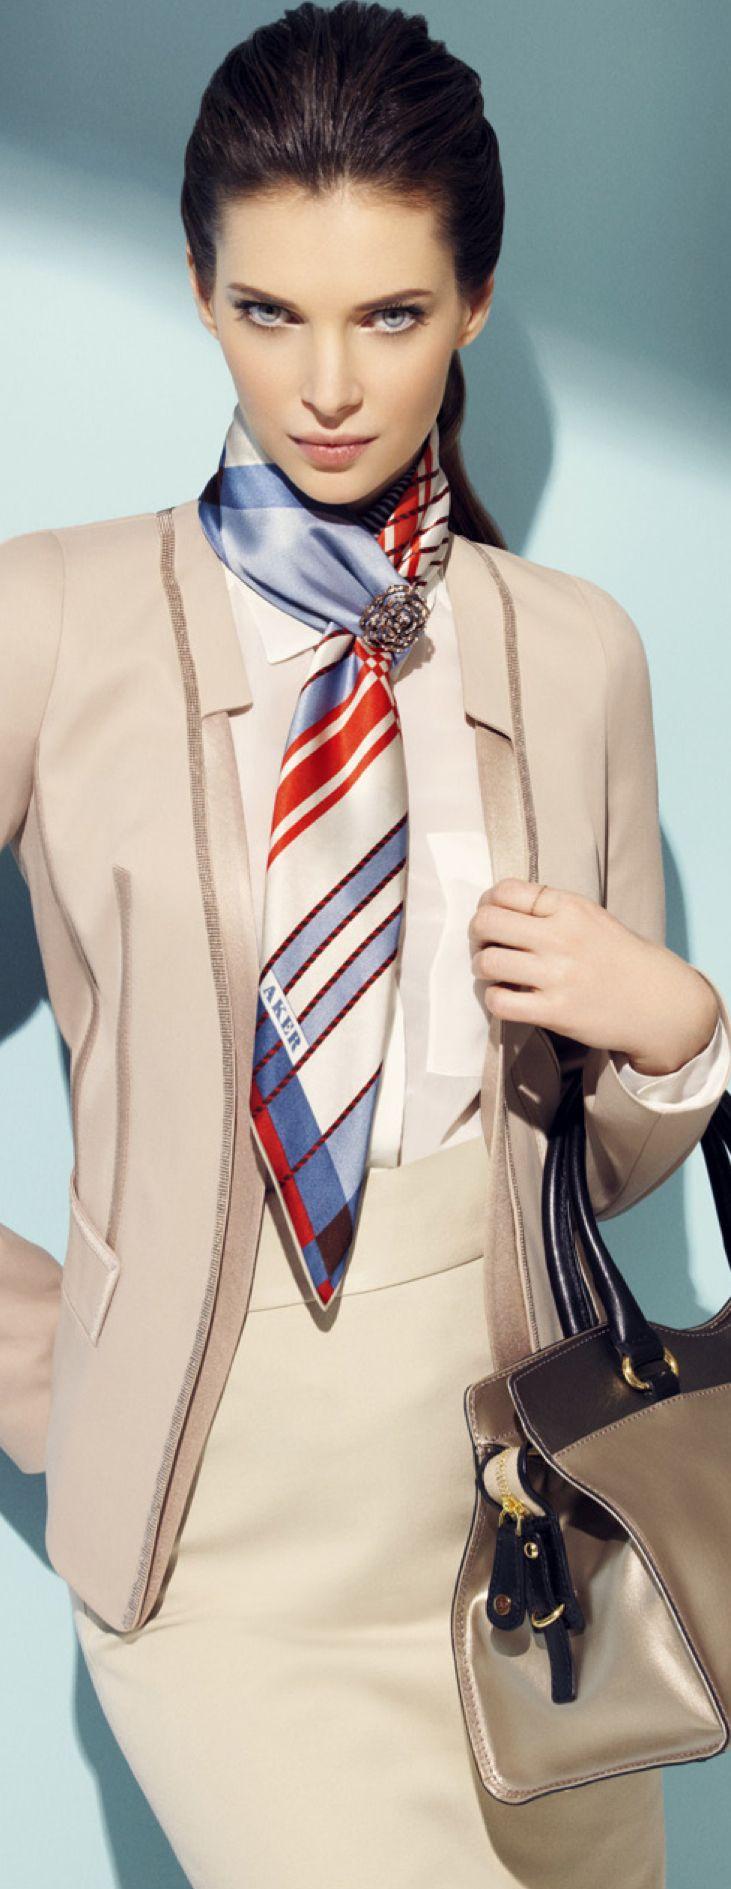 Women's business casual fashion ... #Chic |